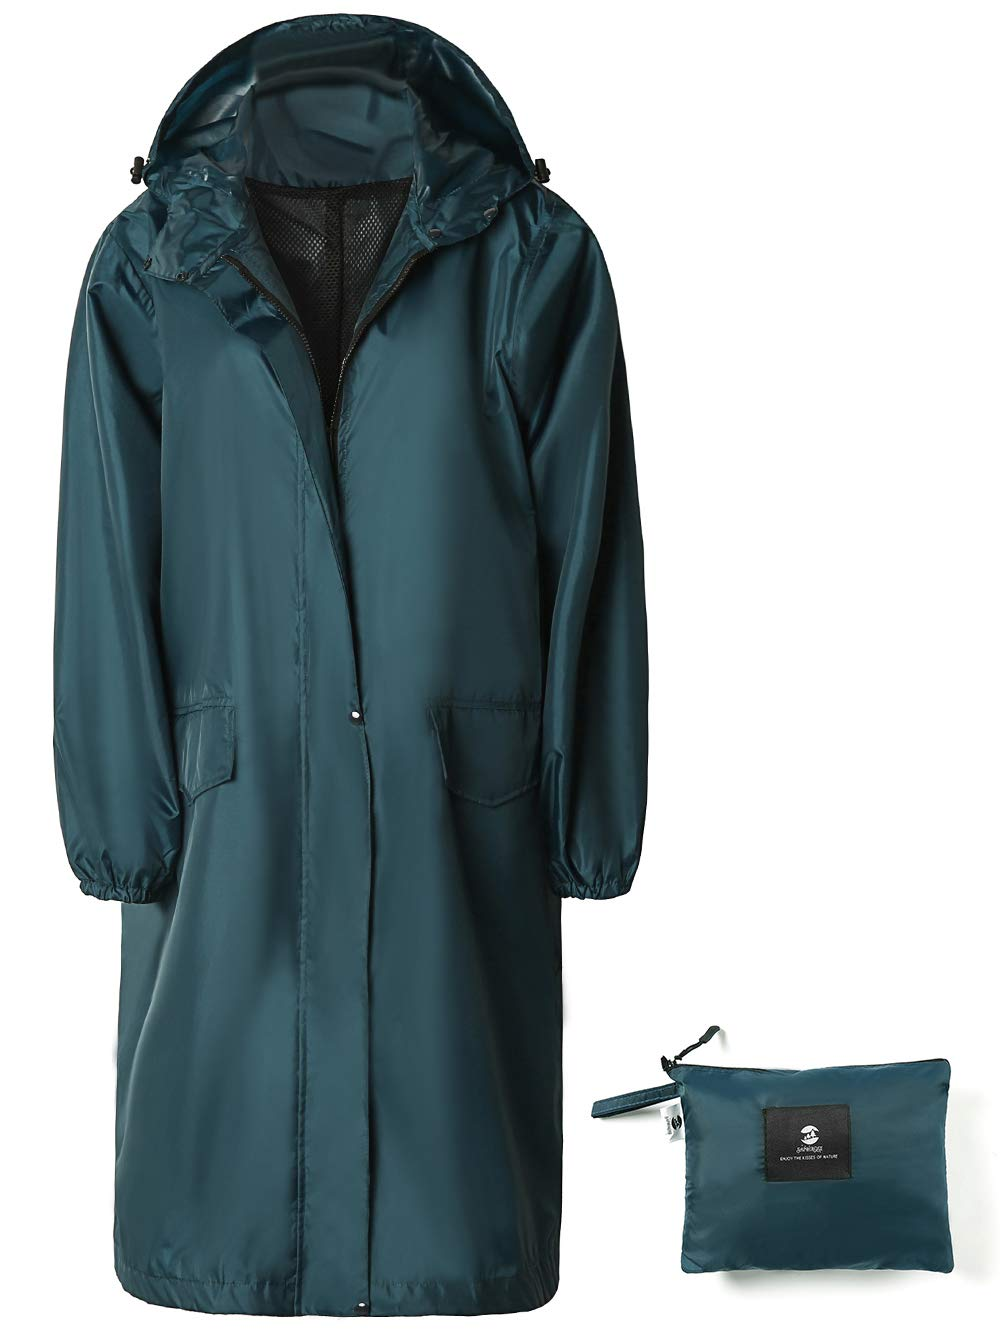 SaphiRose Women's Long Rain Jacket Waterproof Lightweight Hooded Raincoat